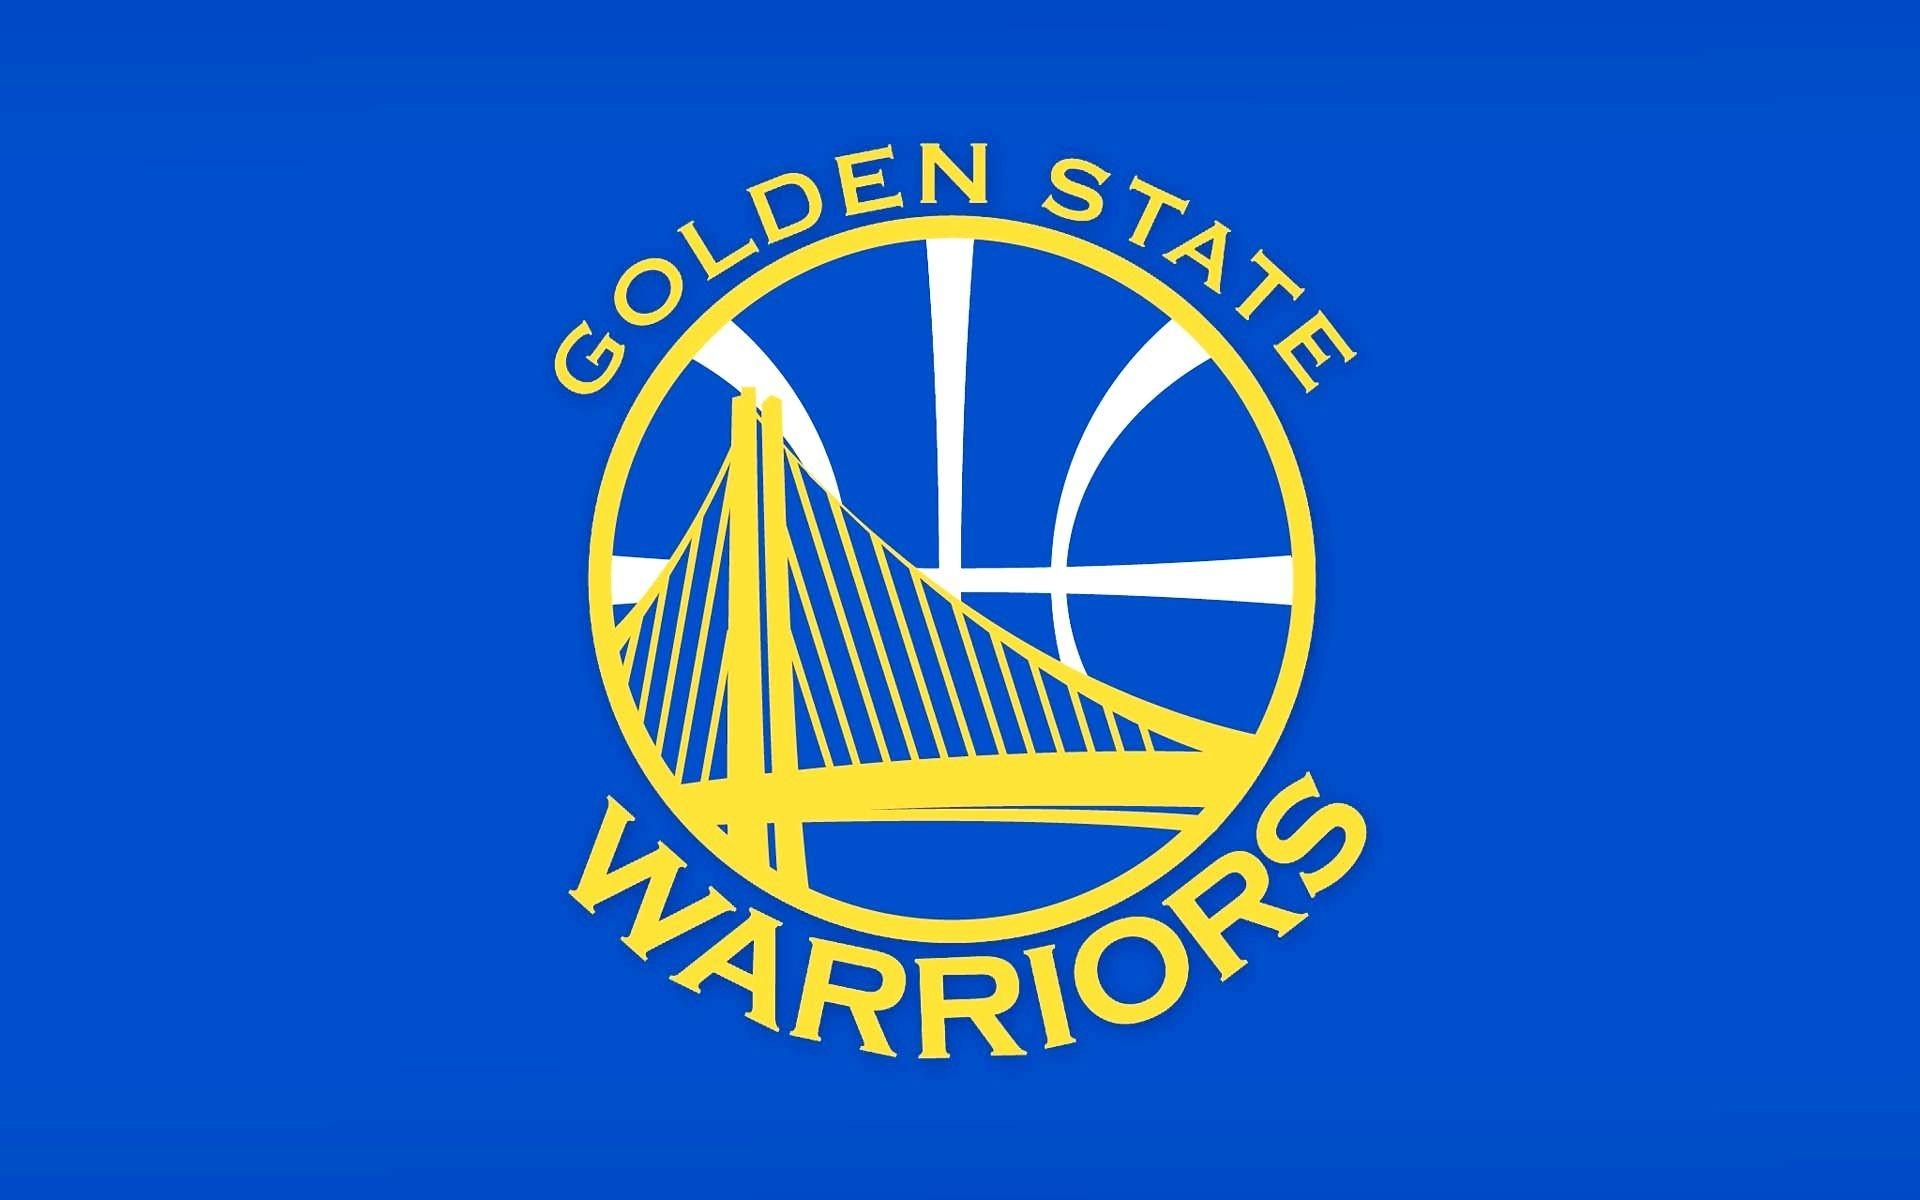 NBA Team Logos Wallpaper 2017 1